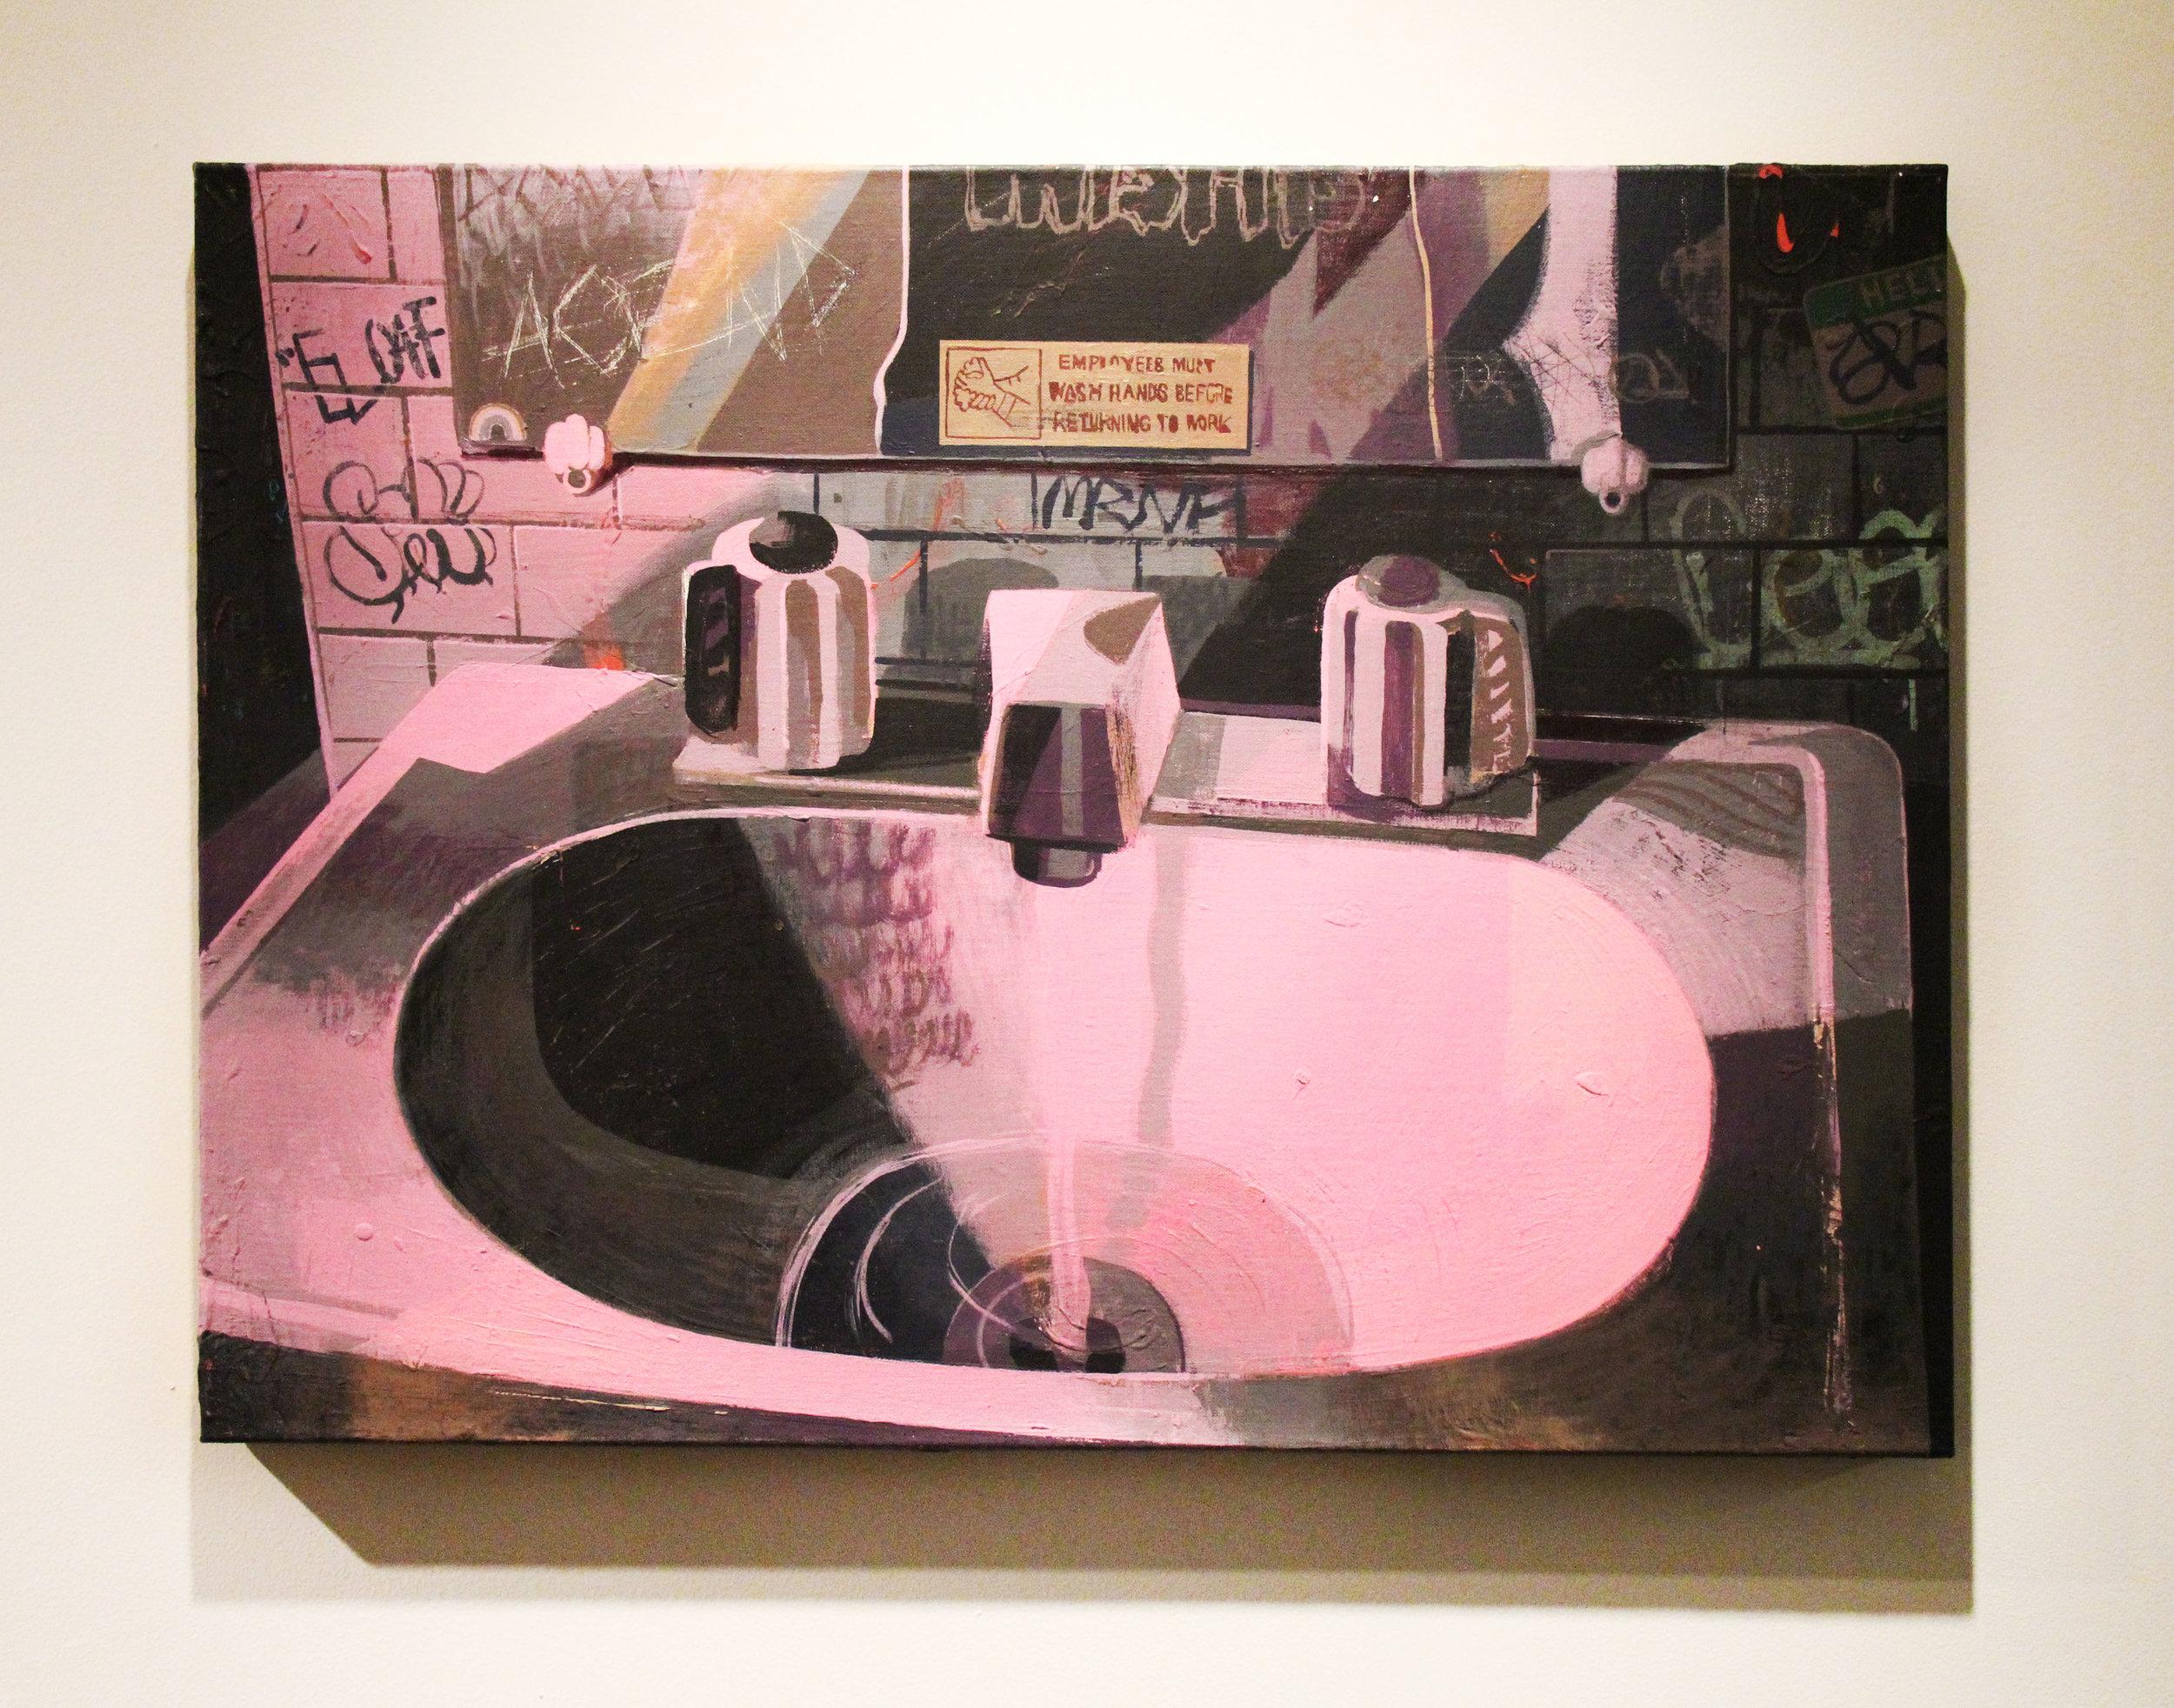 Bathroom at the Bar;  Flashe and acrylic on linen; 2016